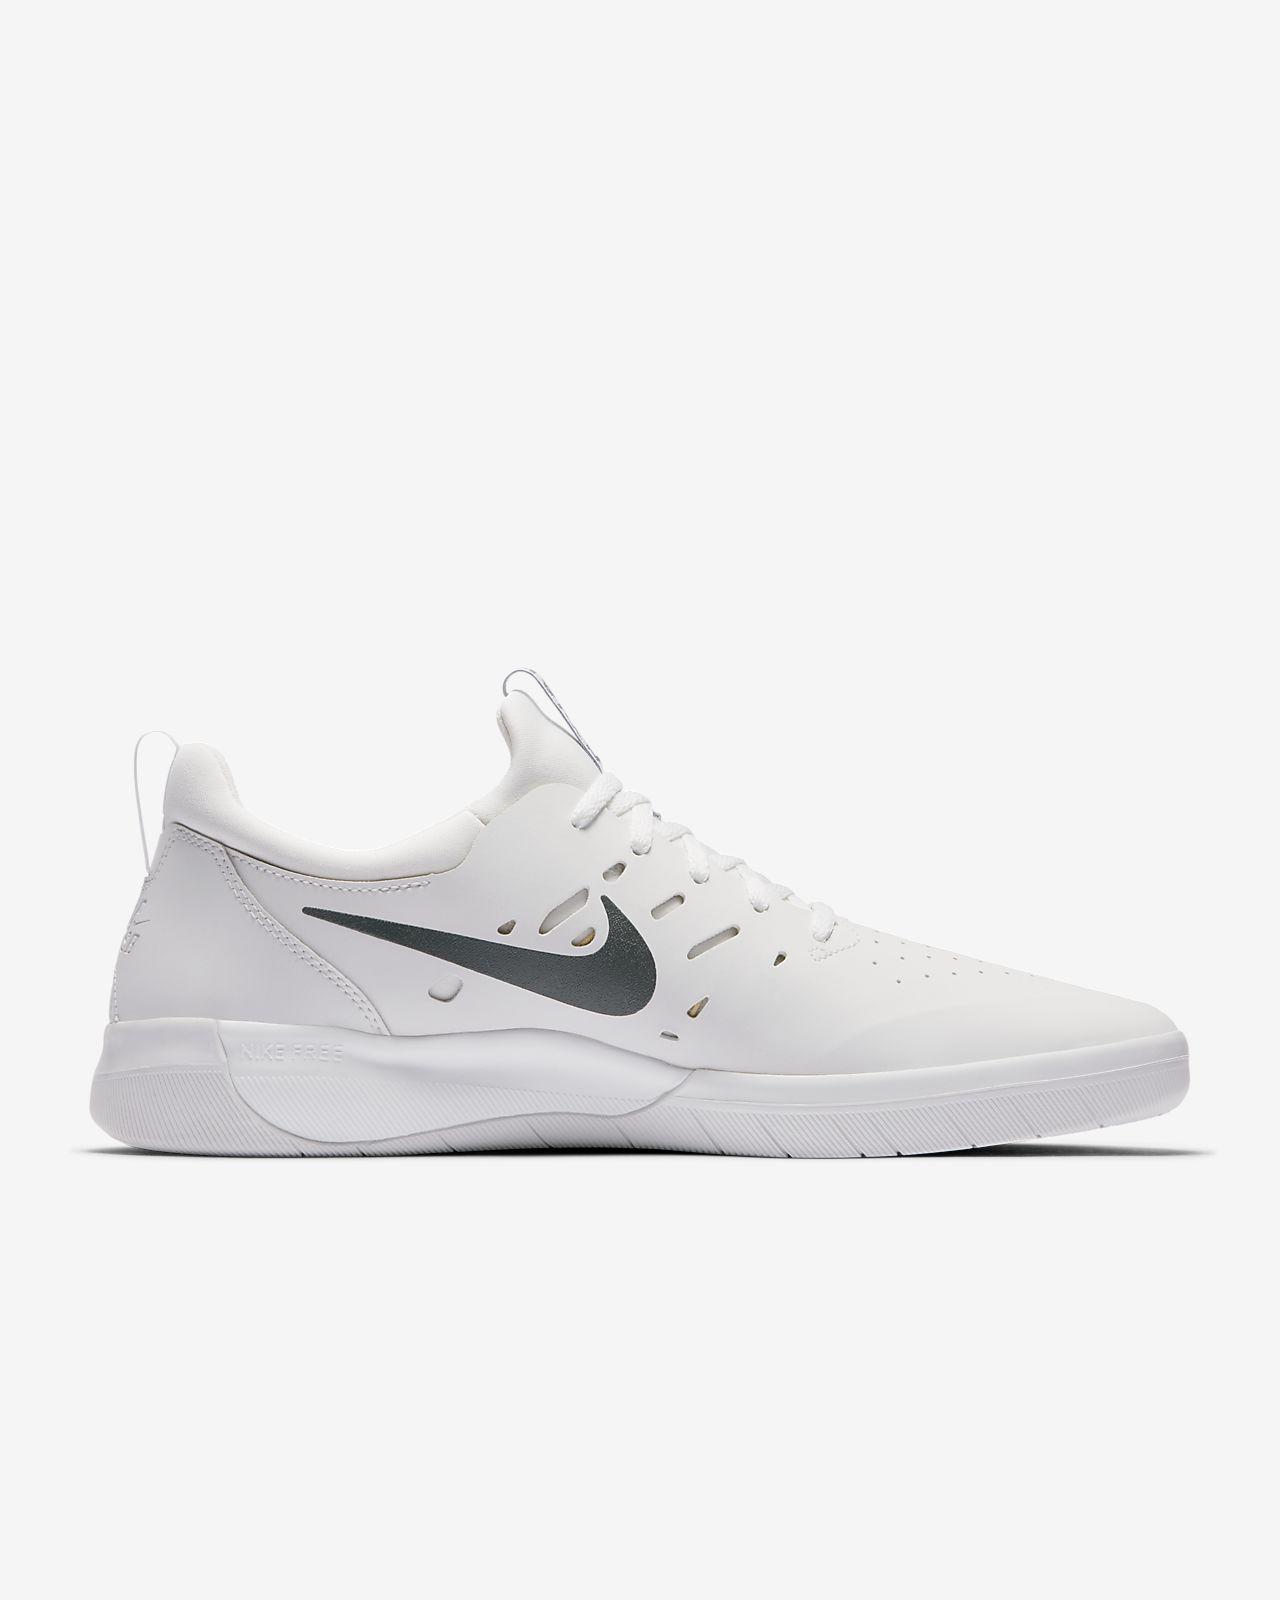 Nike SB Nyjah Free Skate Shoe. Nike DK